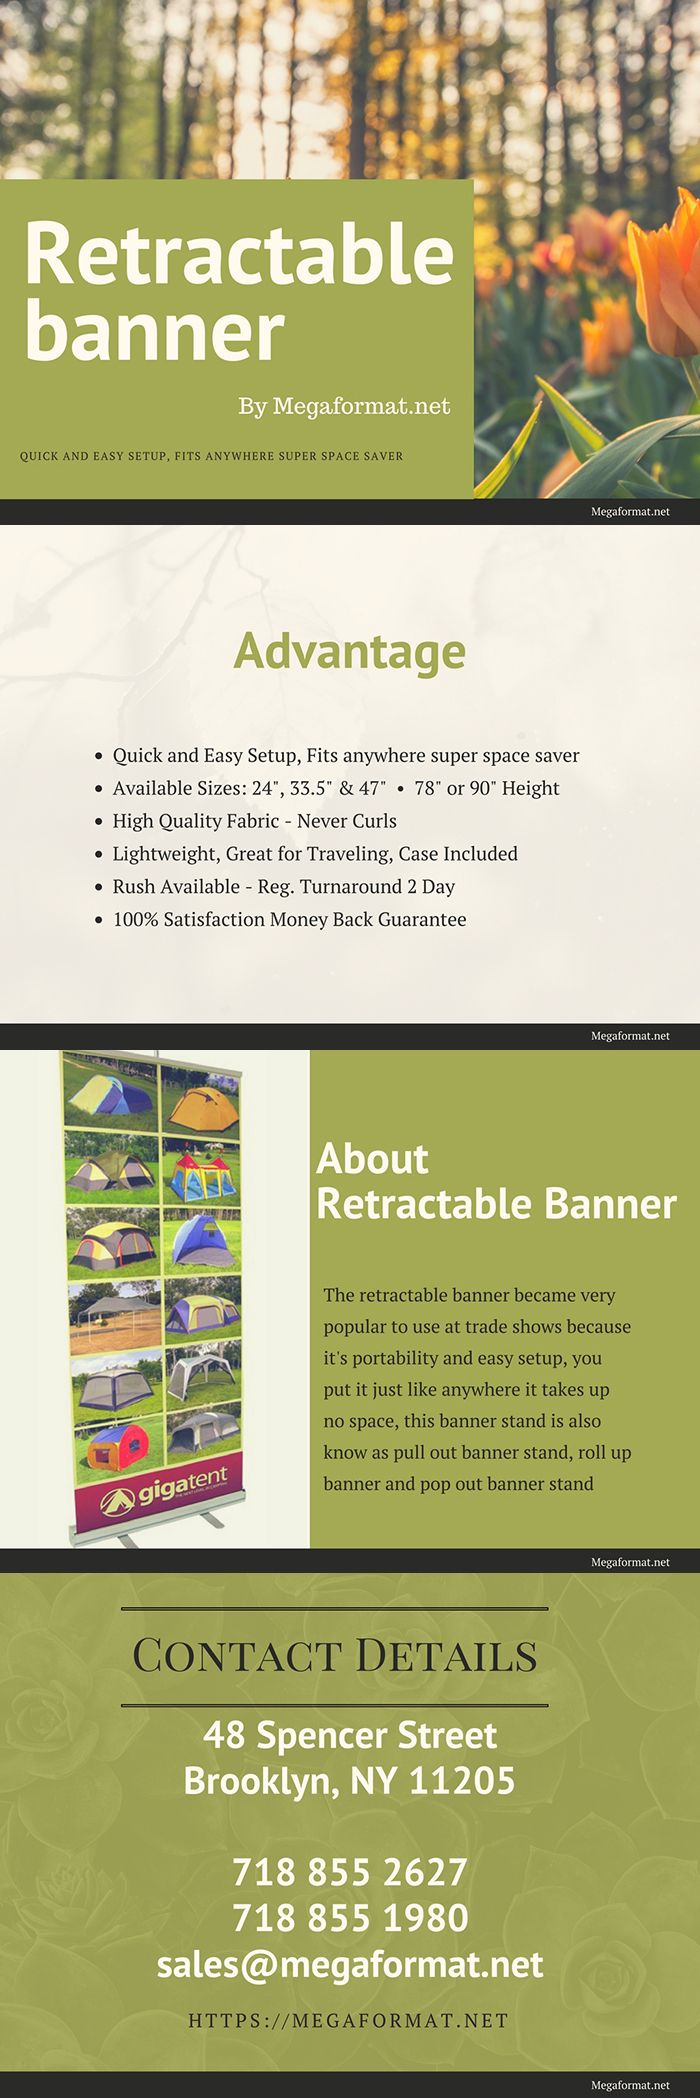 https://www.slideshare.net/MegaFormatSignage/advantage-of-portable-retractable-banners-stands